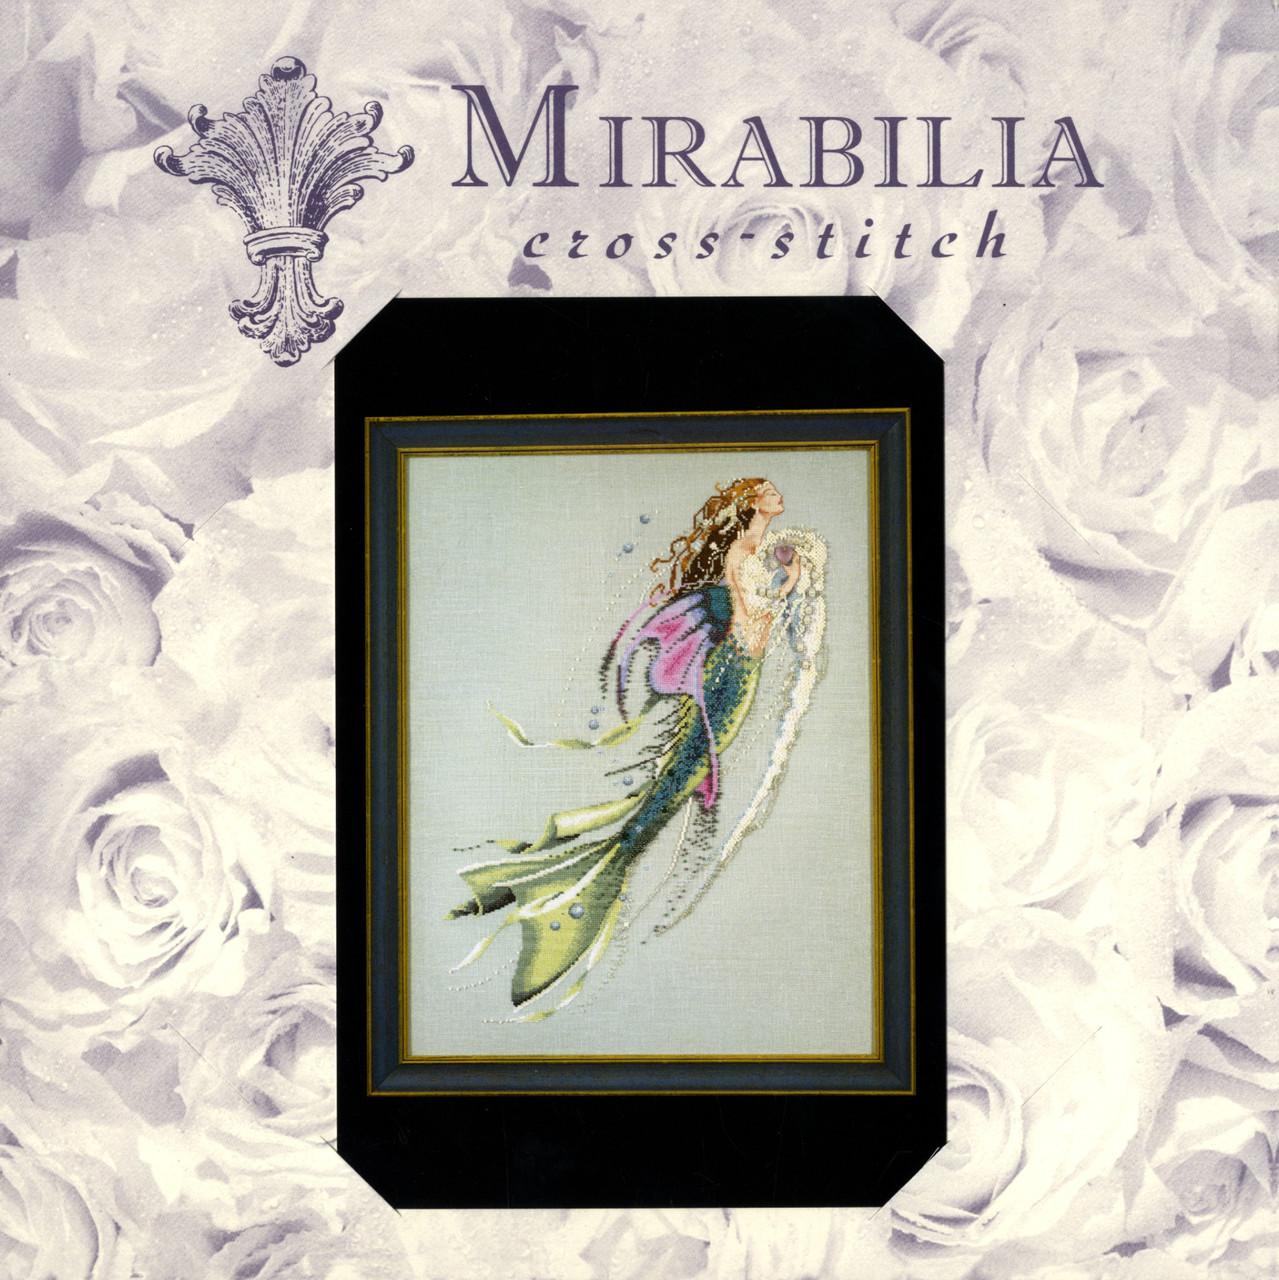 Mirabilia - Mermaid of the Pearls